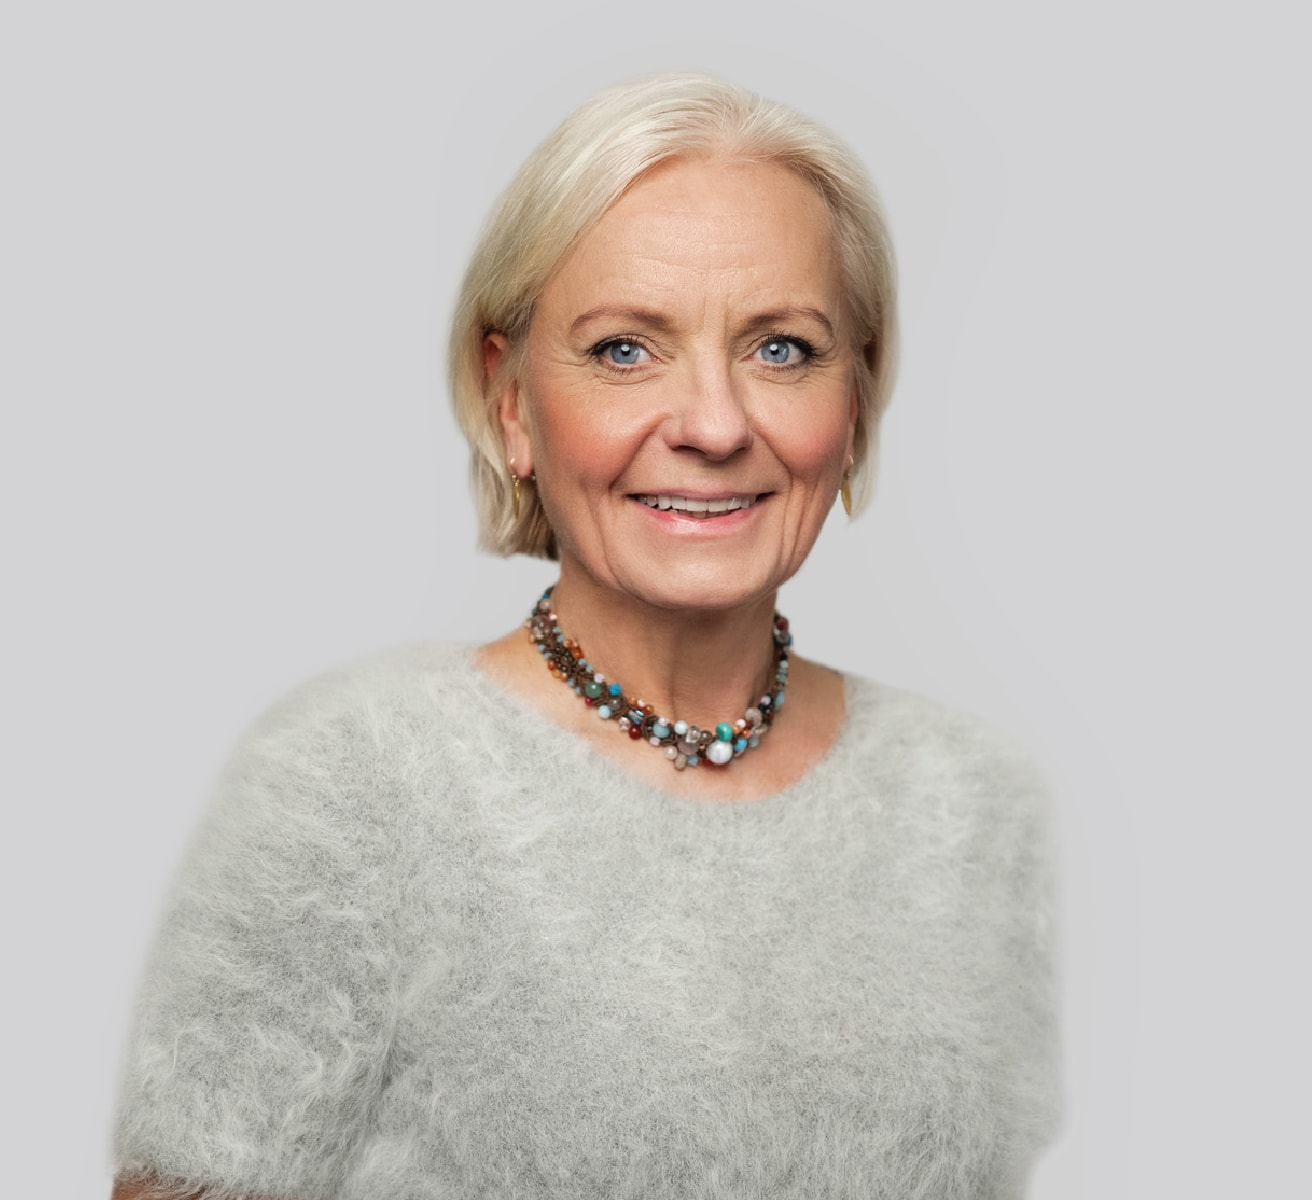 Anna-Karin Eliasson Celsing